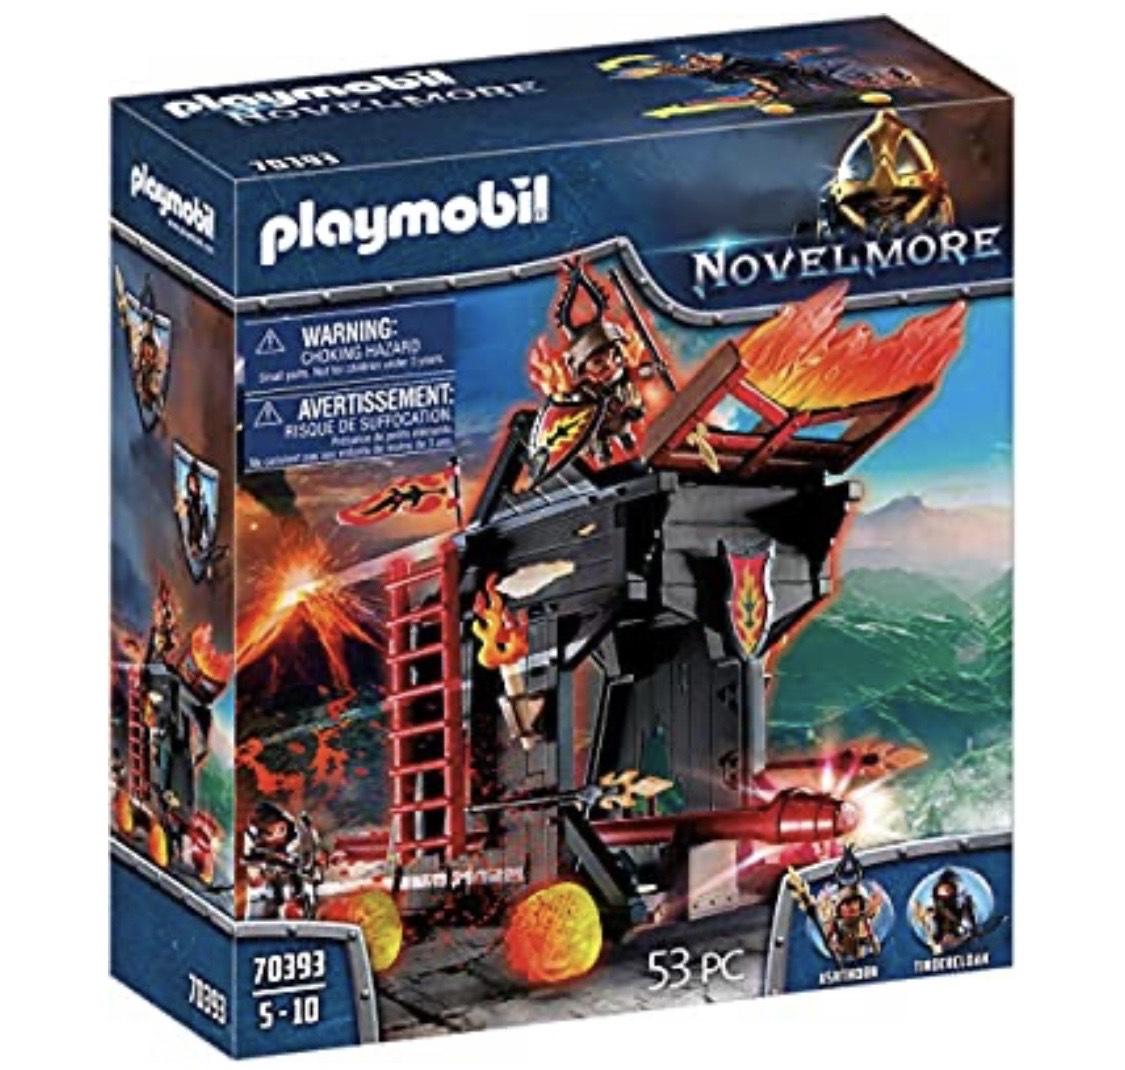 PLAYMOBIL Novelmore 70393 Feuerrammbock